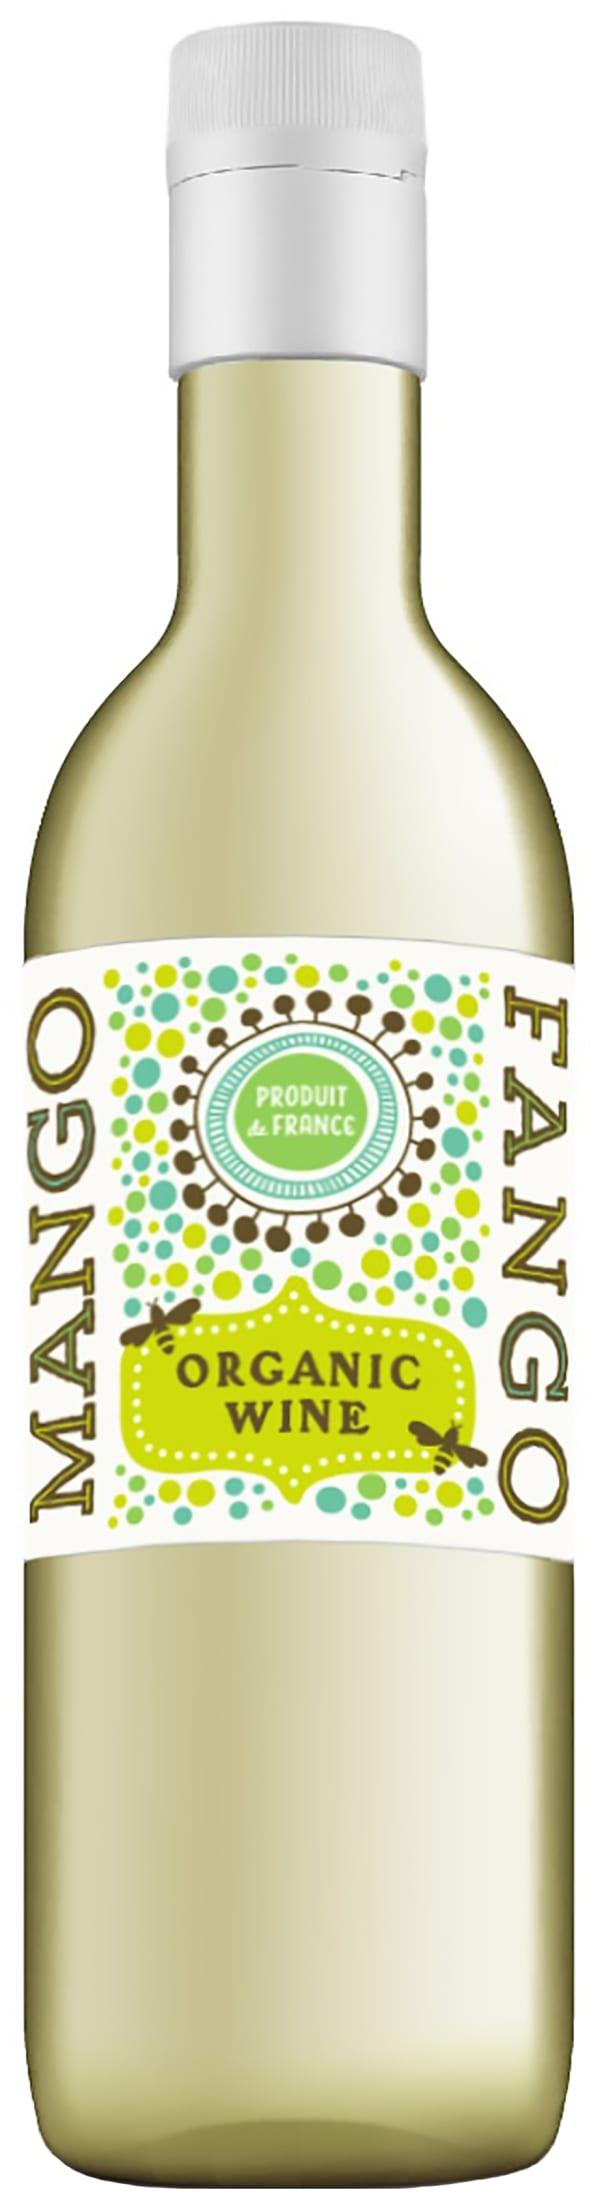 Mango Fango Chardonnay Organic 2016 plastic bottle